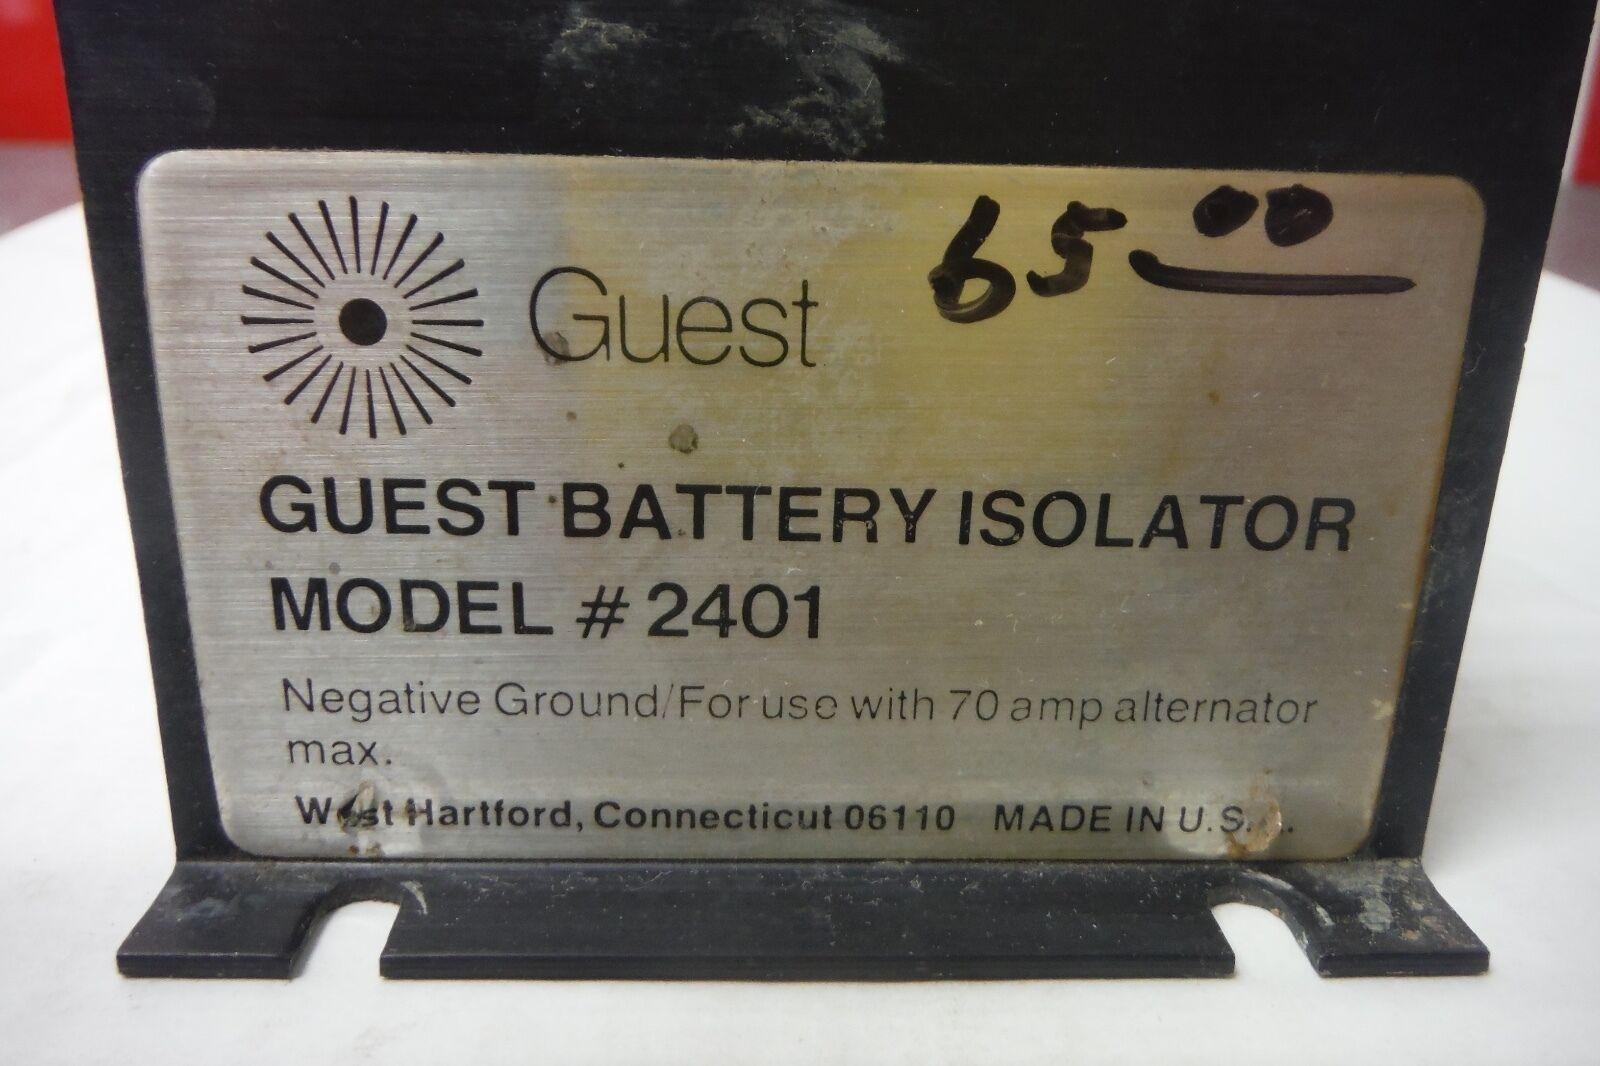 quest battery isolator wiring diagram xa 3953  battery isolator wiring diagram together with guest  battery isolator wiring diagram